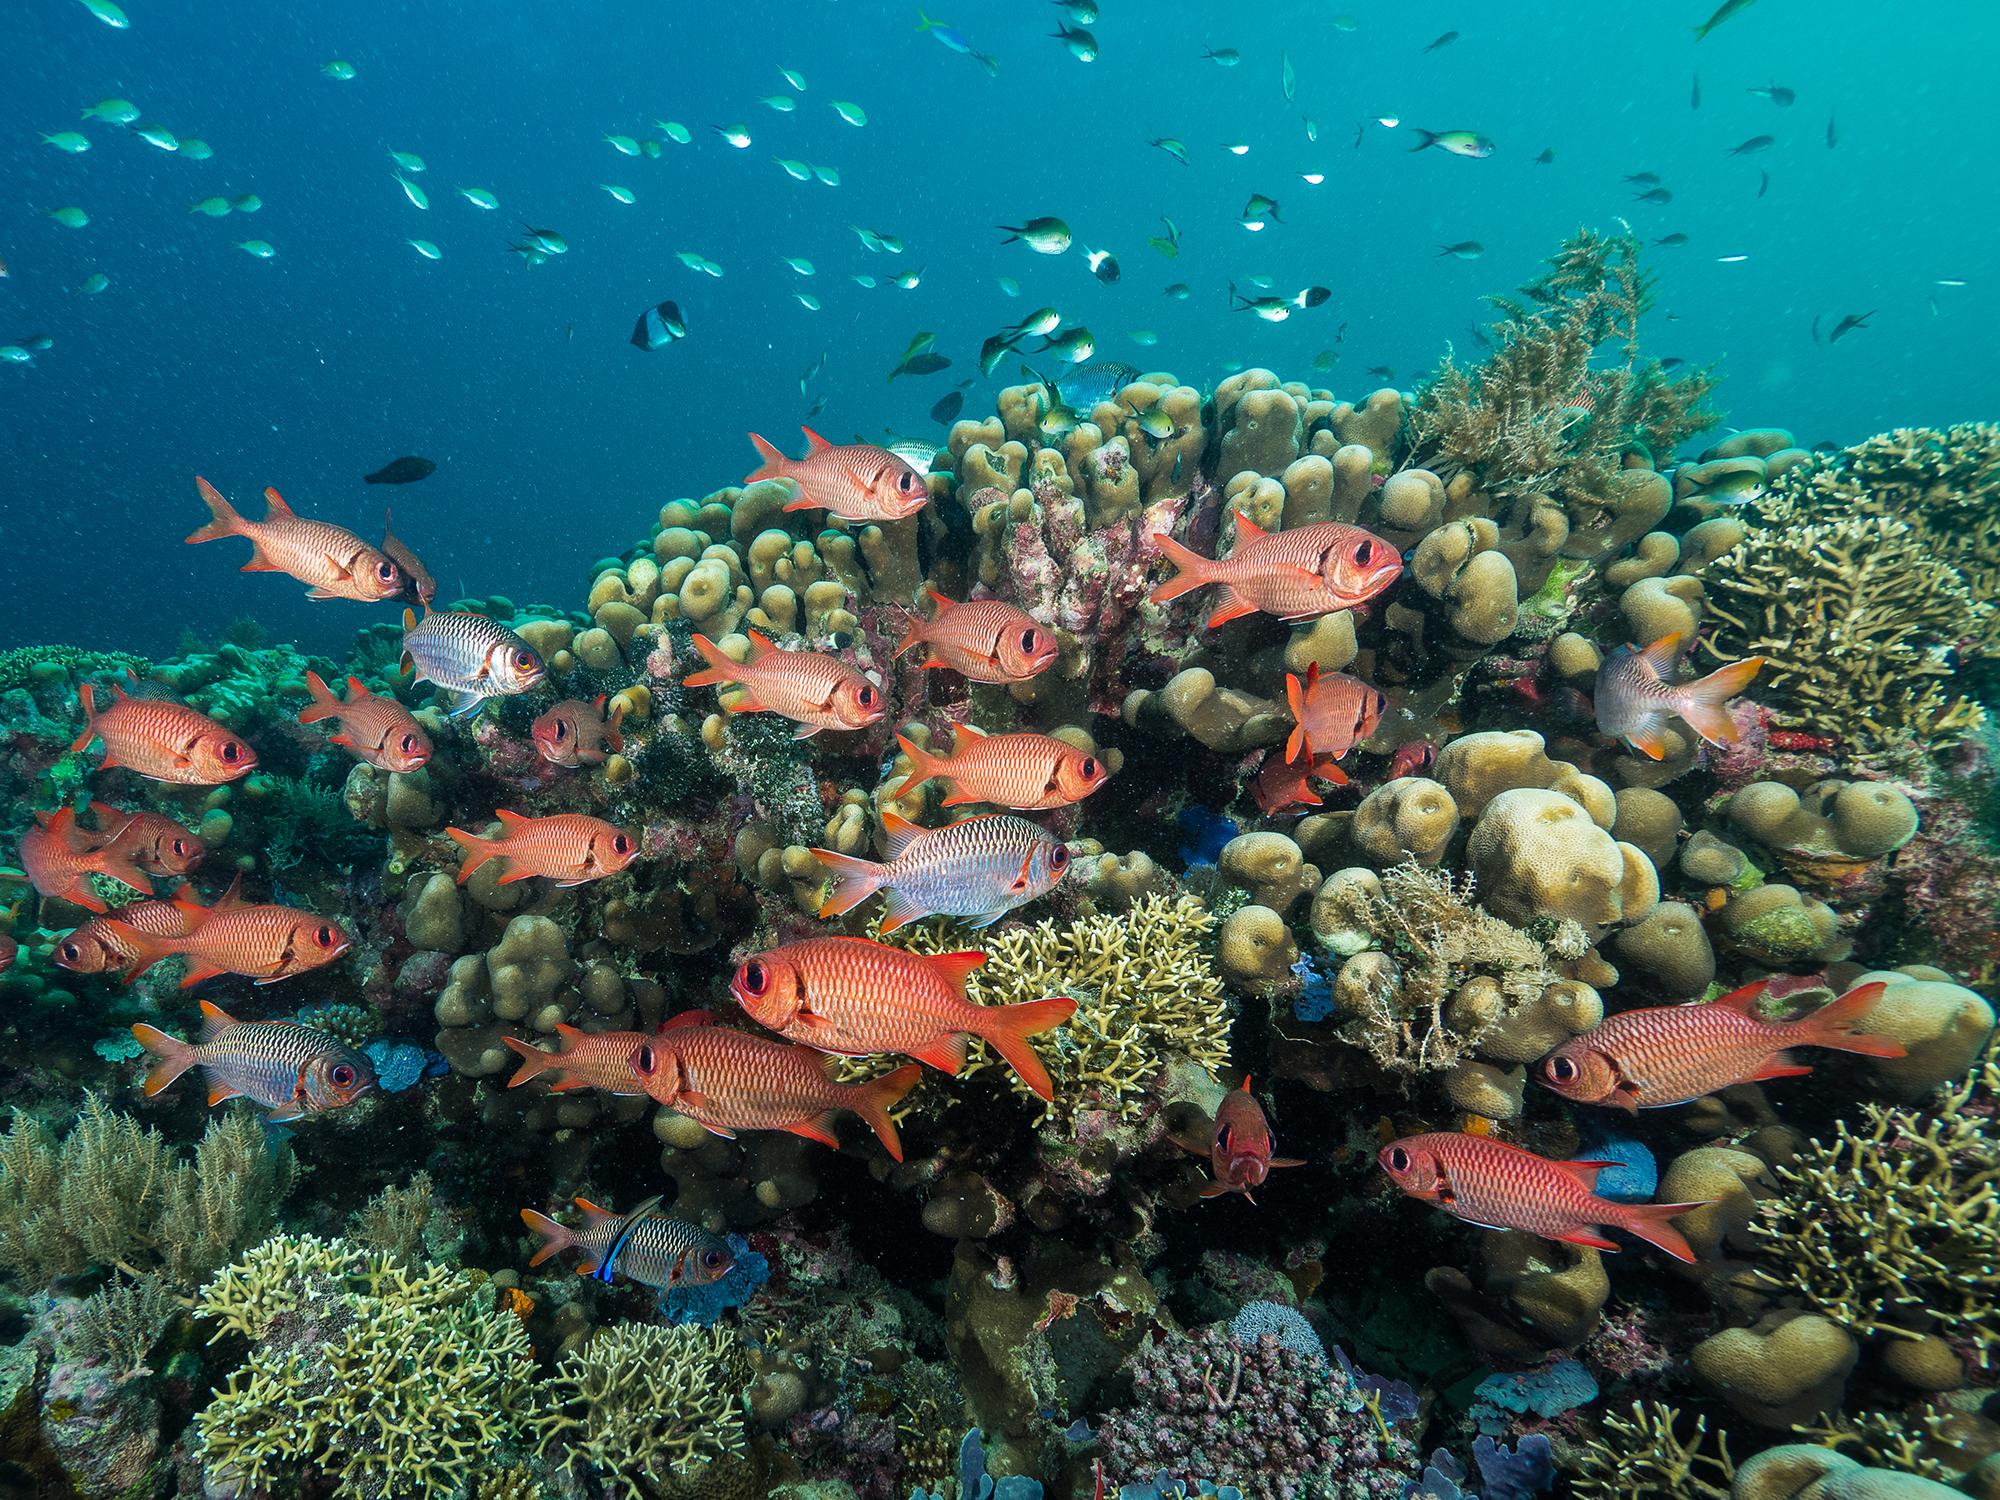 Mafia Island Marine Park, Tanzania CREDIT: SIMON J. PIERCE / coral reef image bank